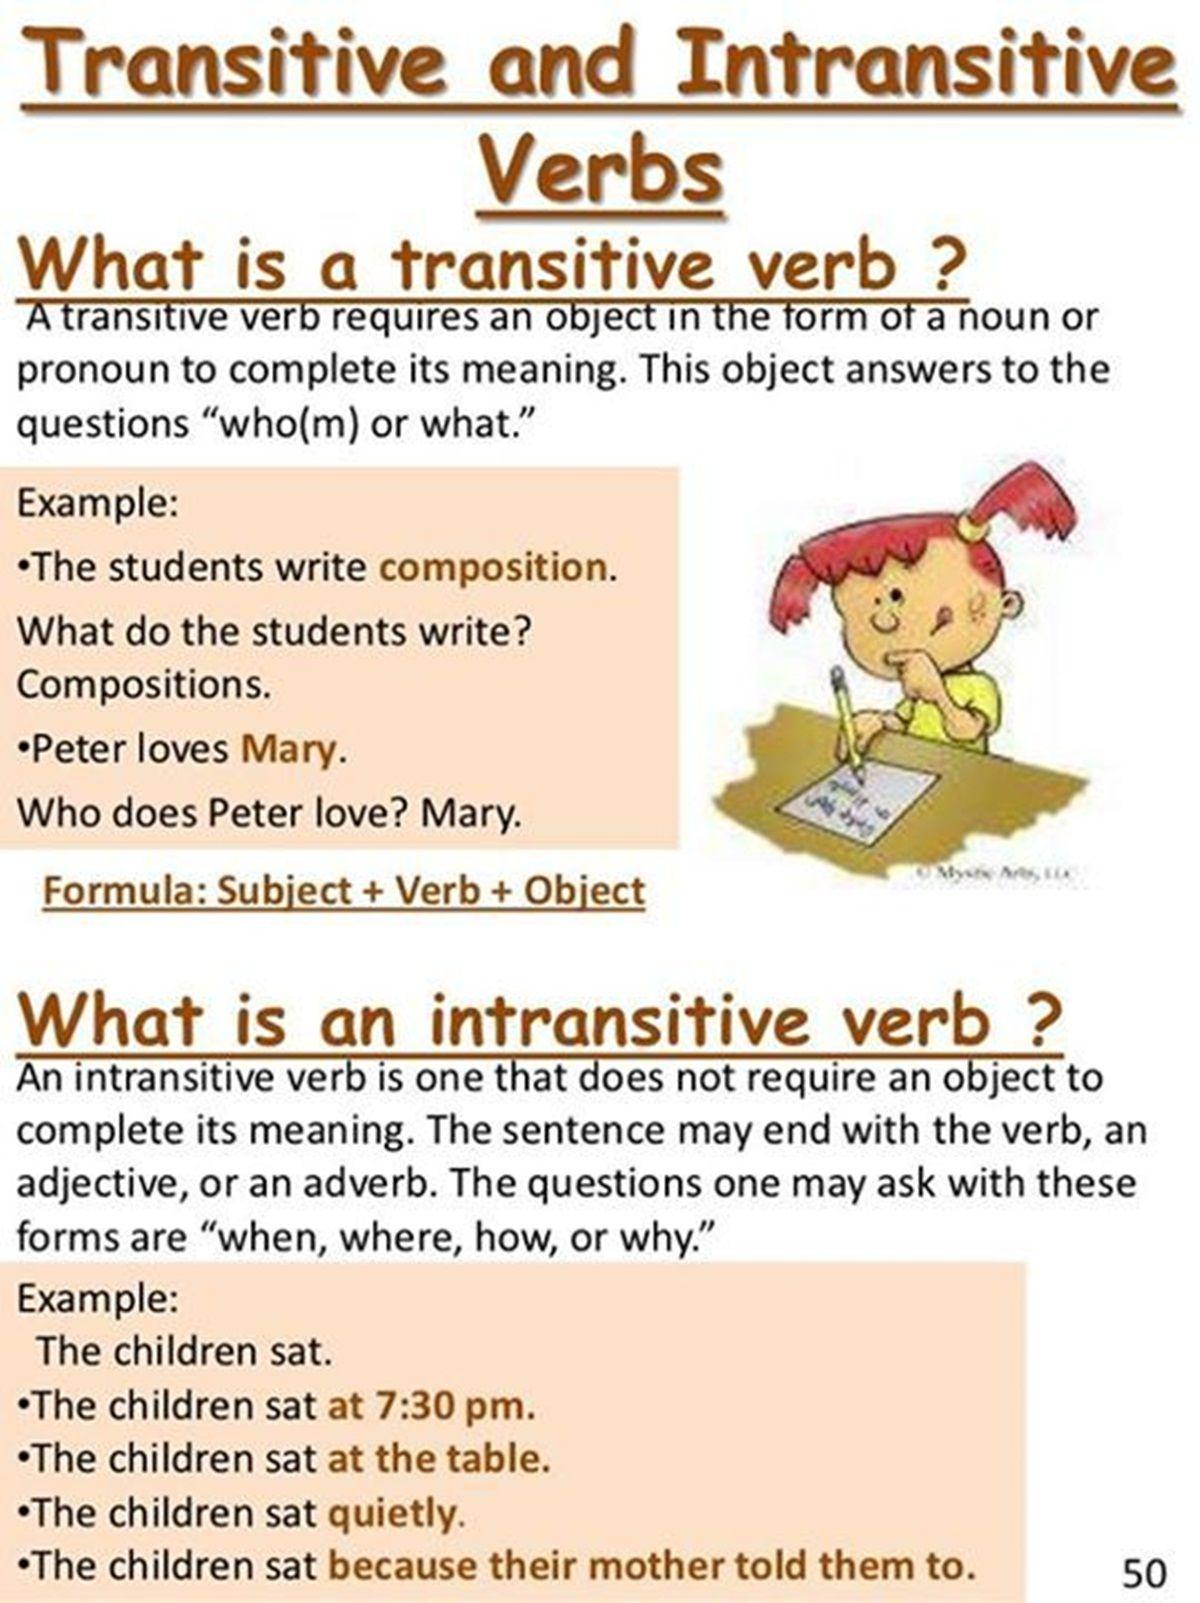 Pin By Artur Bibik On Angielski Intransitive Verb Verb Worksheets English Grammar